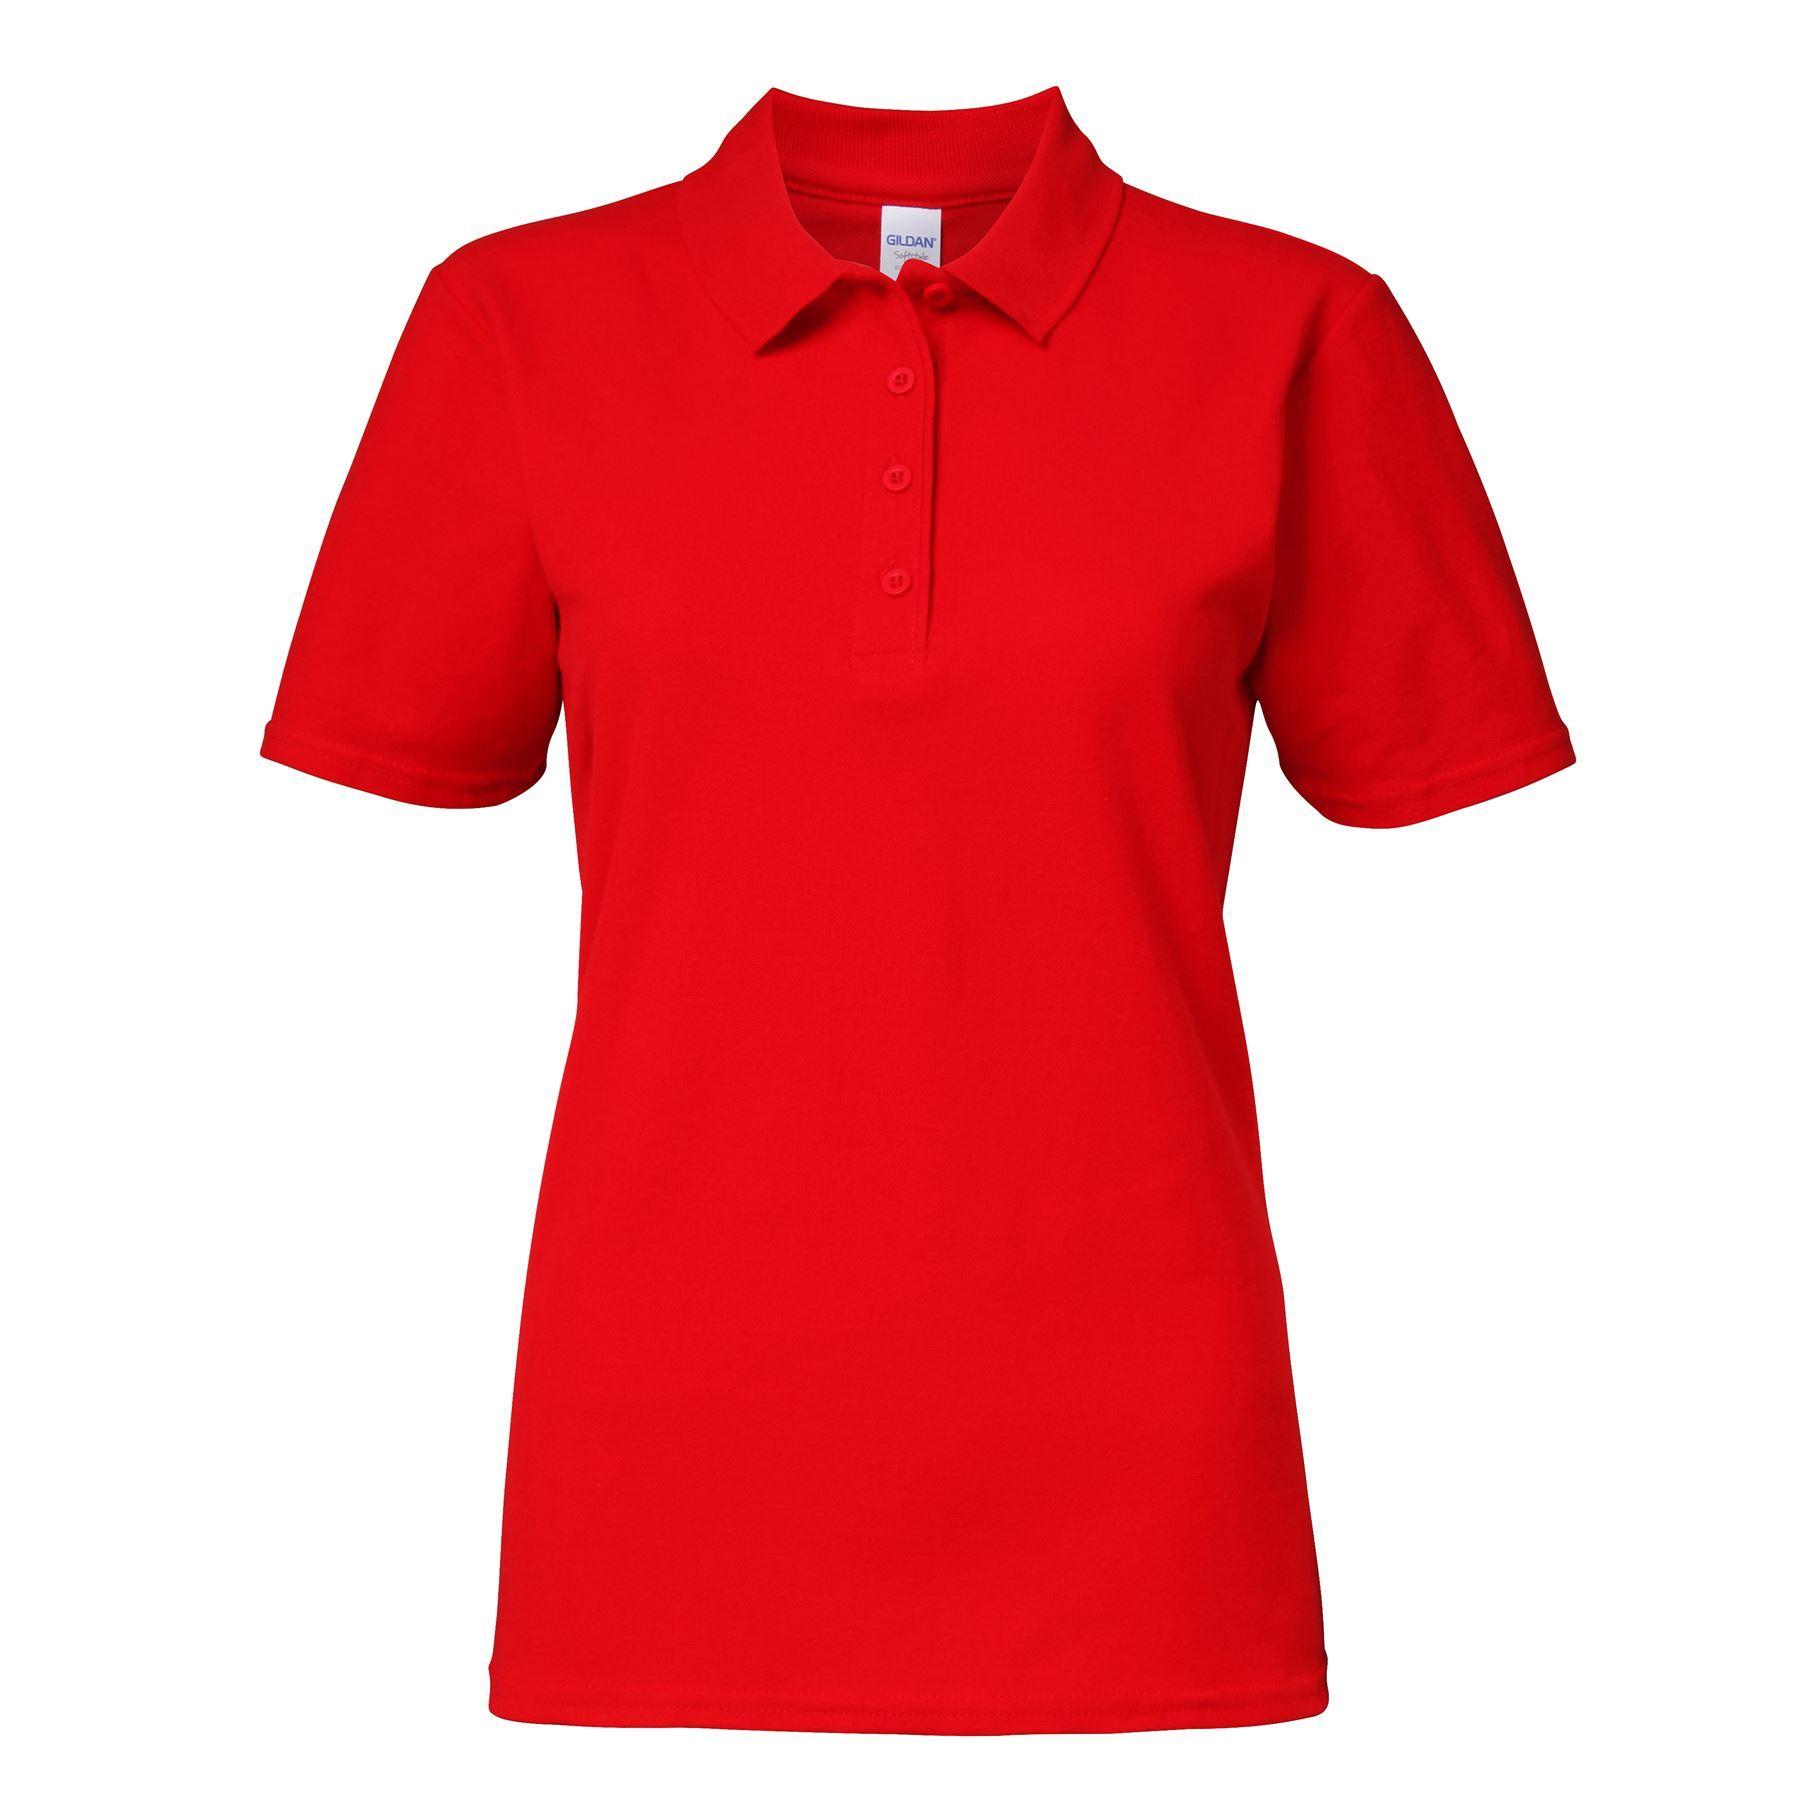 3-5-10-Pack-Gildan-GD018-Women-039-s-softstyle-double-pique-polo-S-2XL-lot